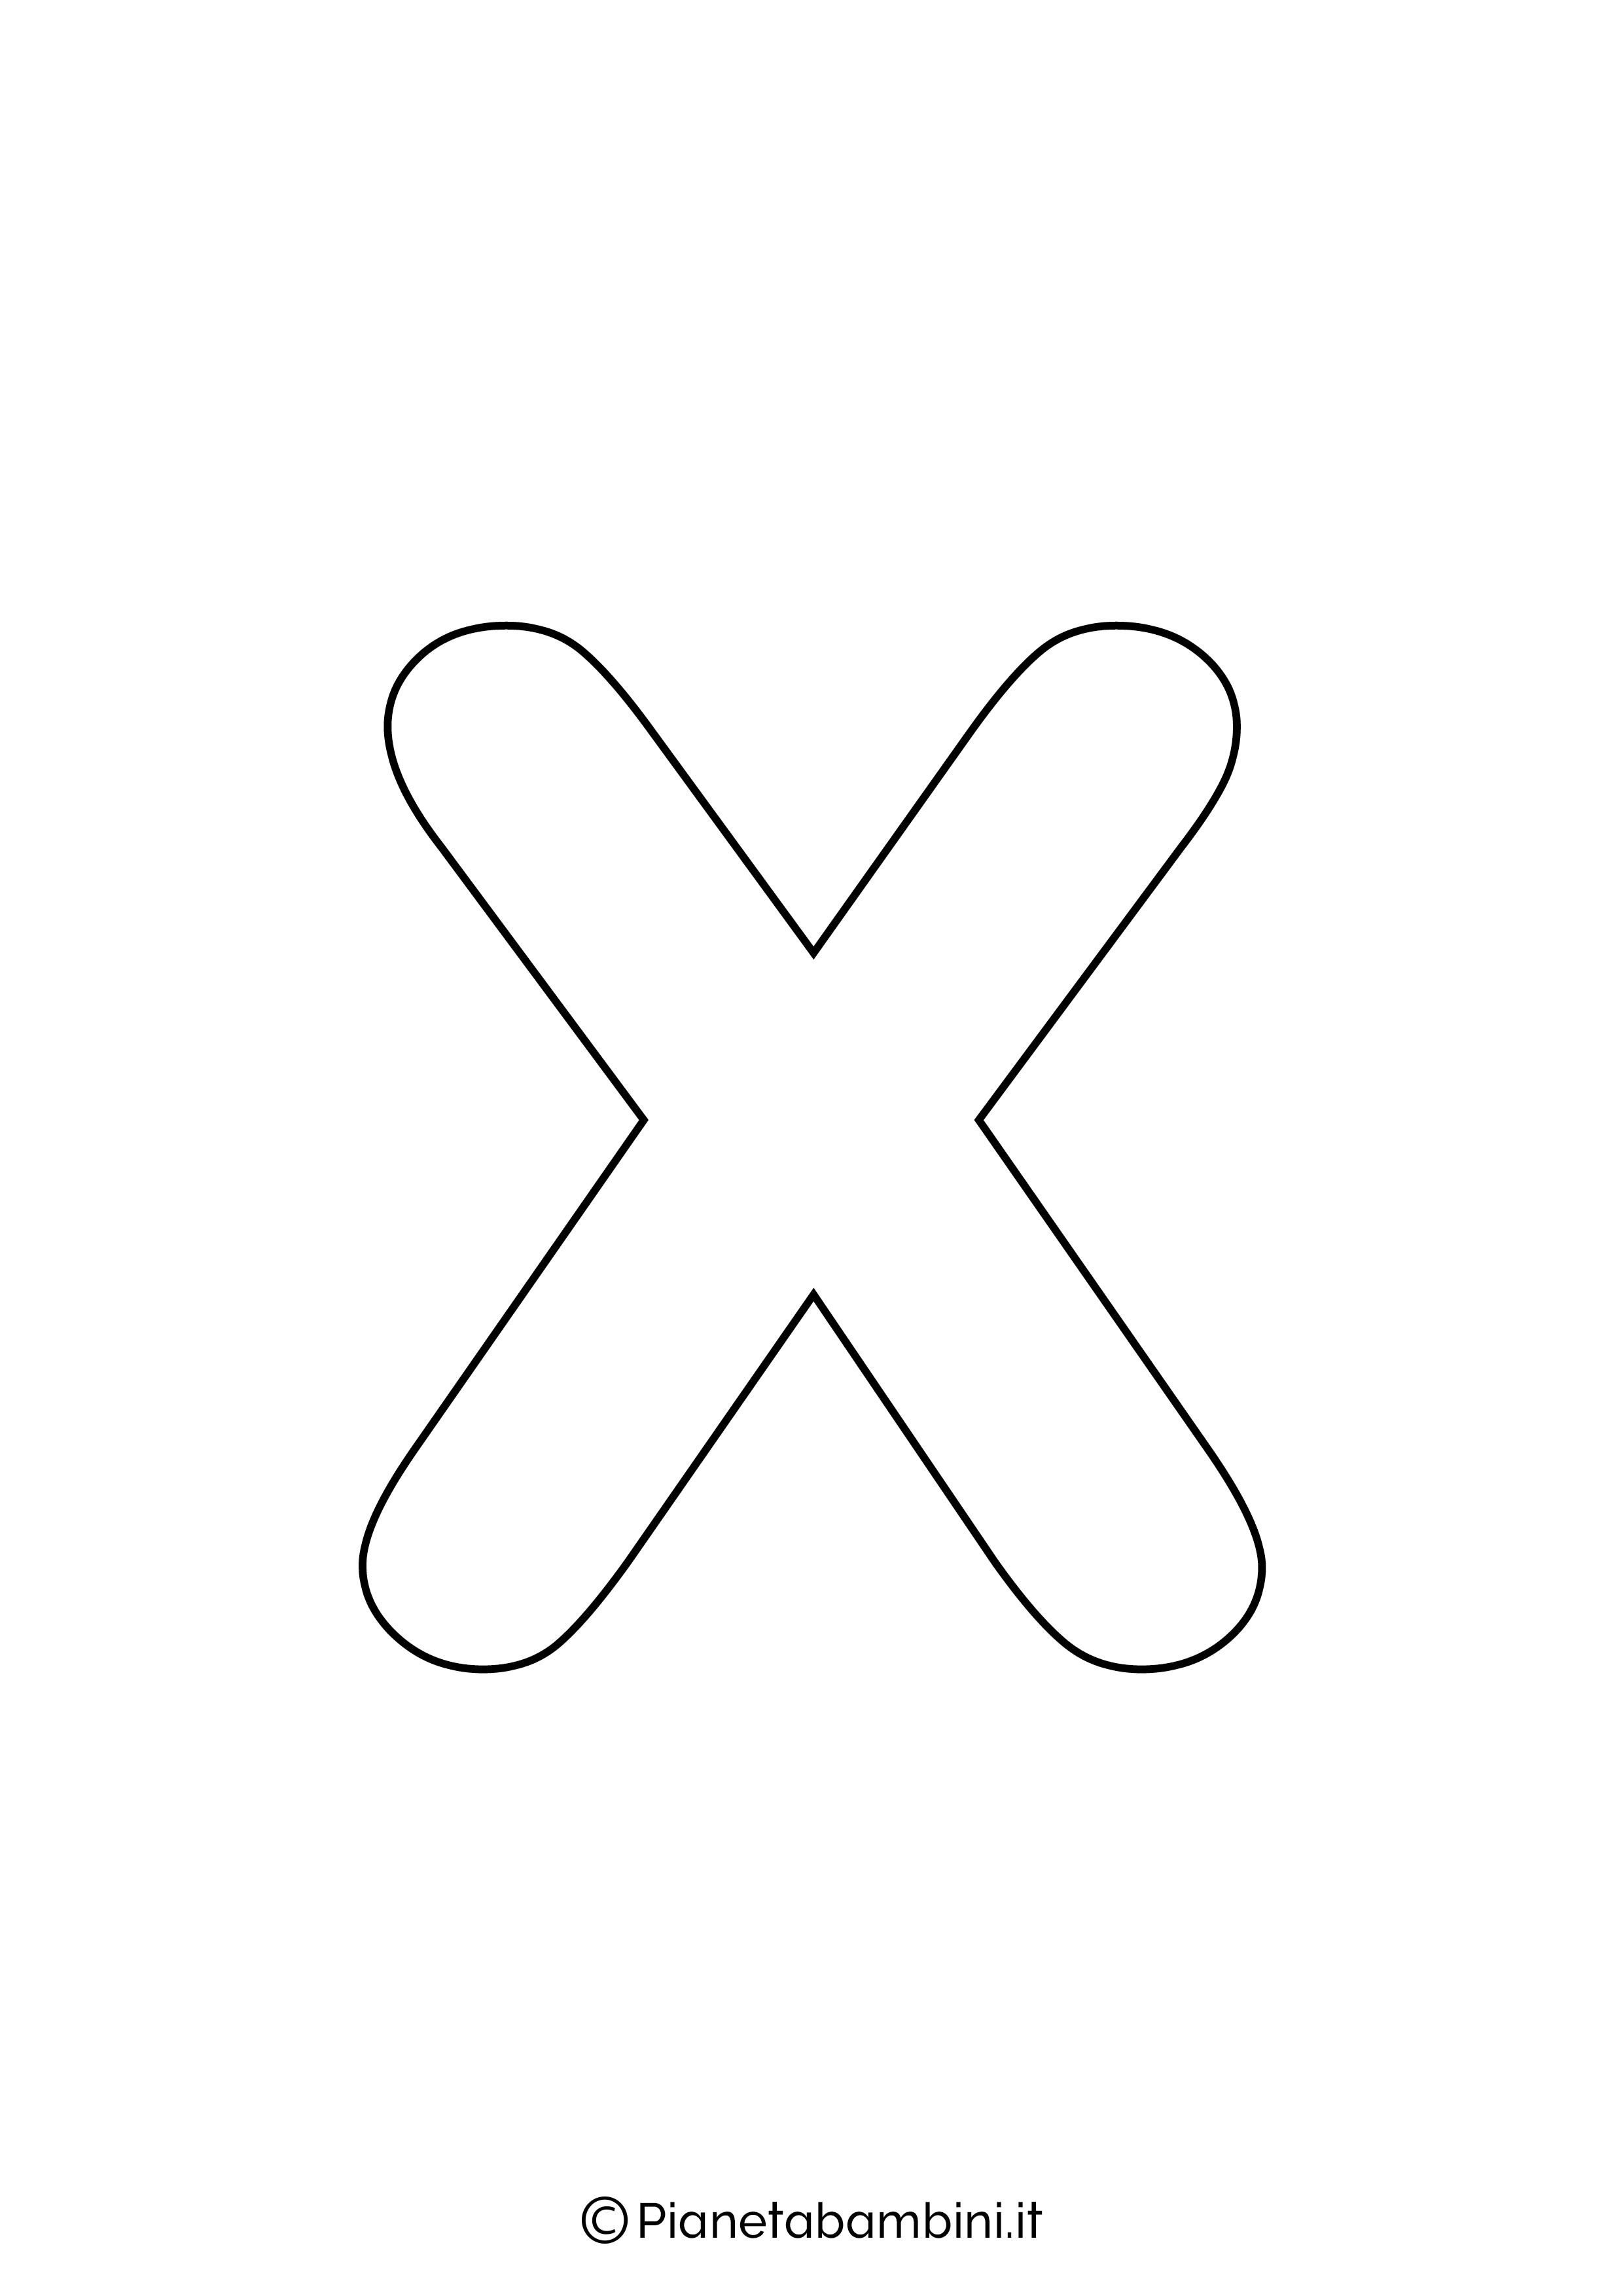 Lettera X minuscola da stampare